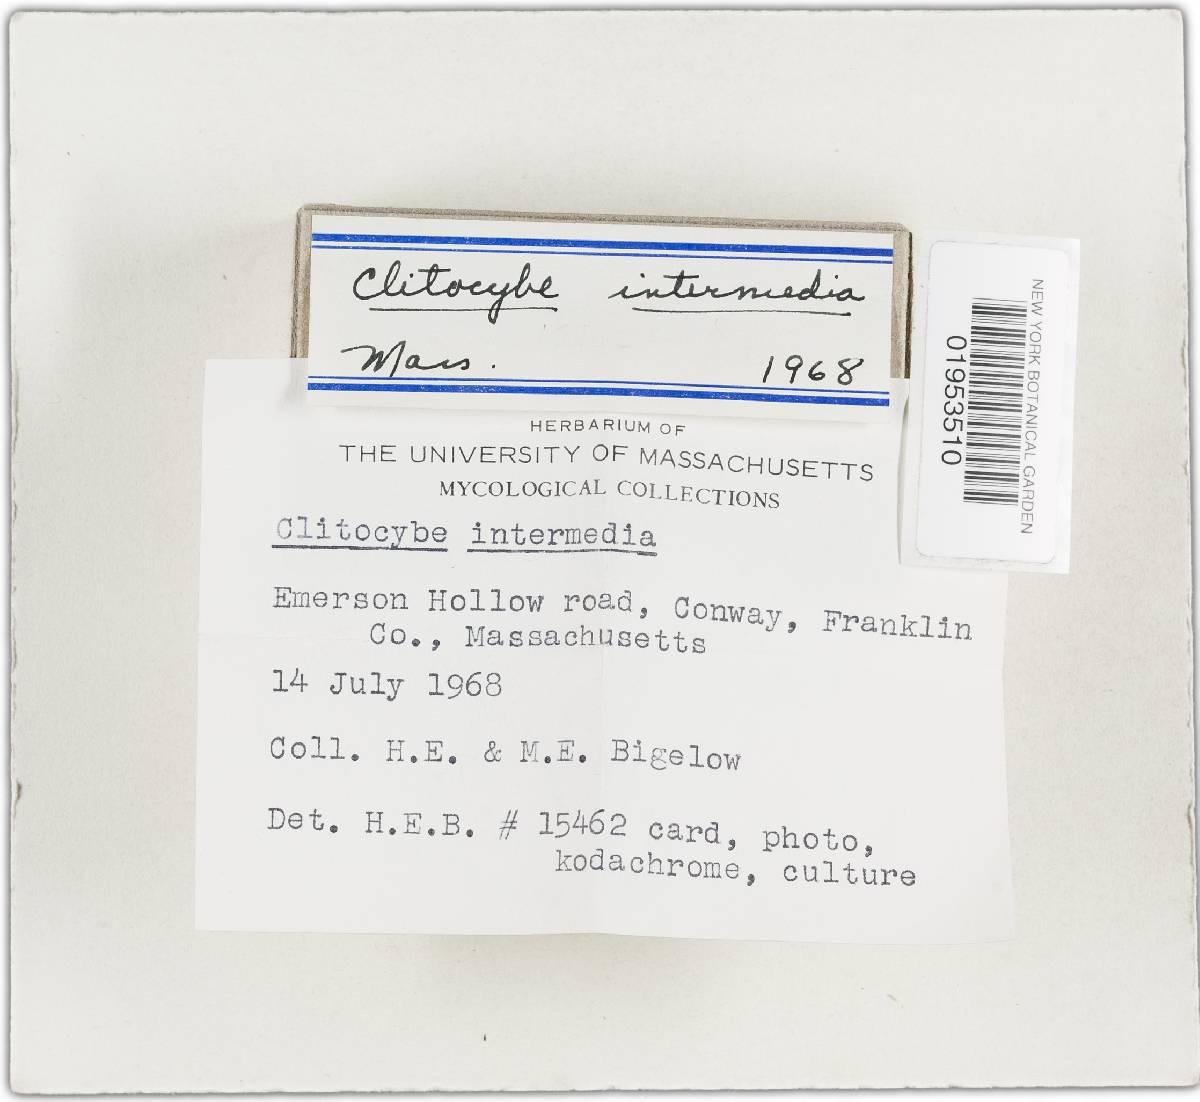 Clitocybe intermedia image